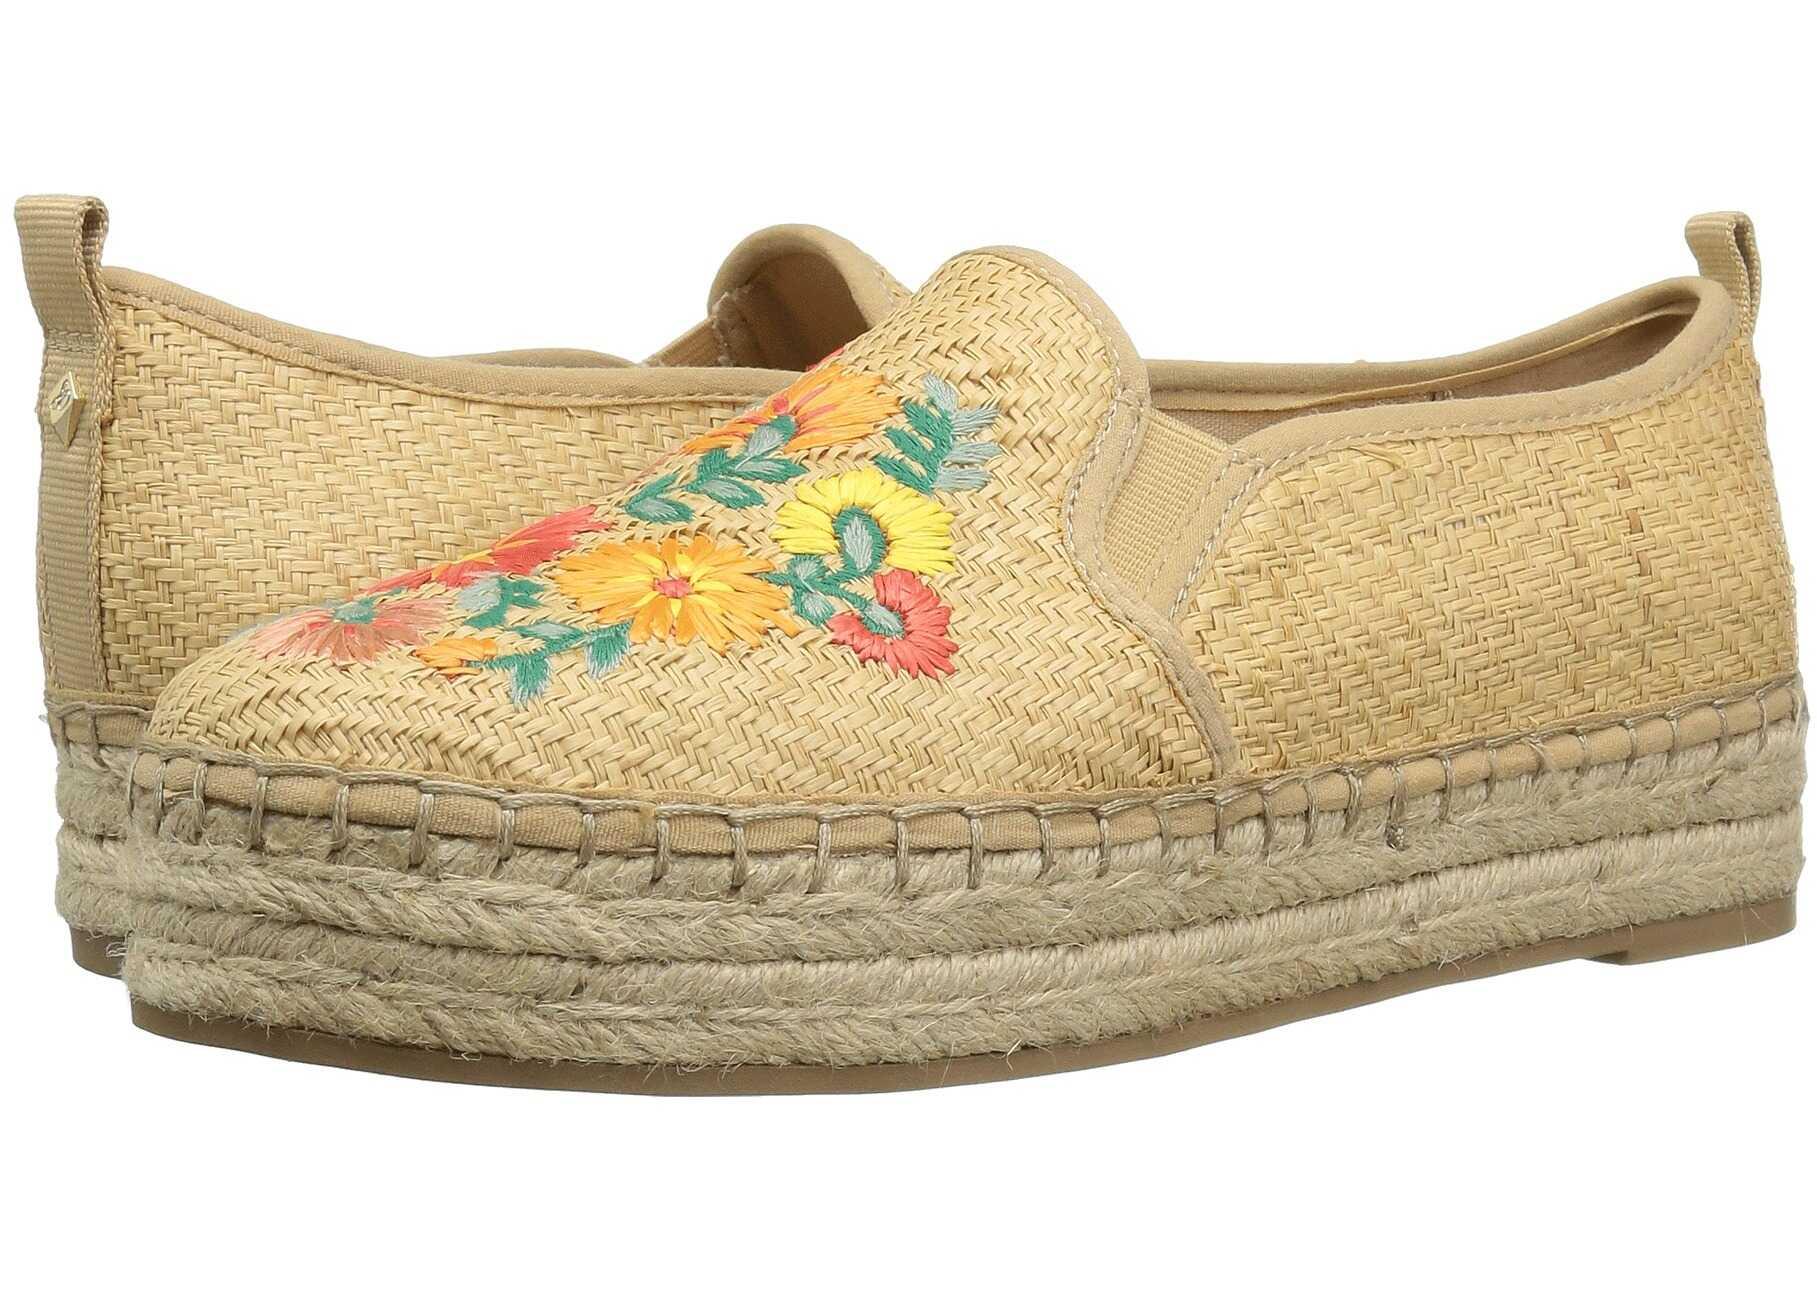 Sam Edelman Carrin 3 Natural Basket Weave Raffia/Bright Multi Riveria Floral Raffia